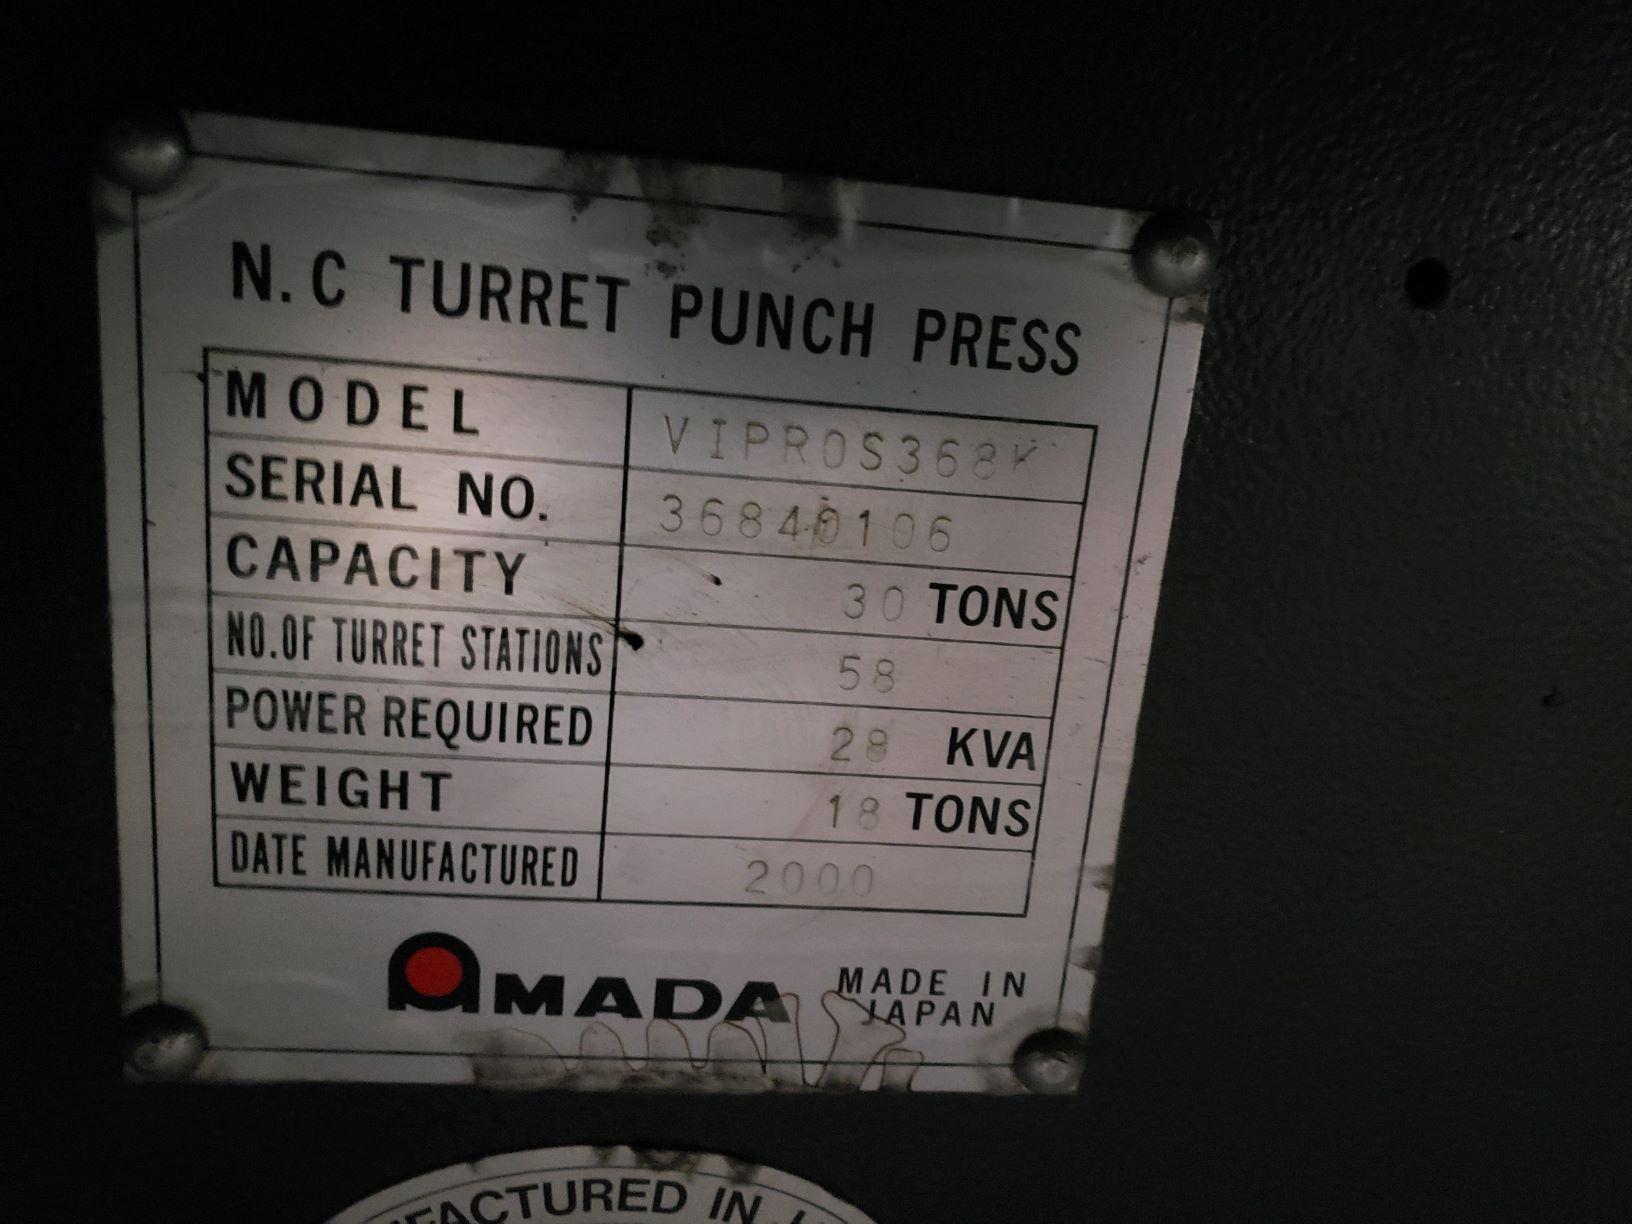 AMADA33 TON AMADA VIPROS 368 KING II, FANUC 18P CNC CONTROL NEW 2000